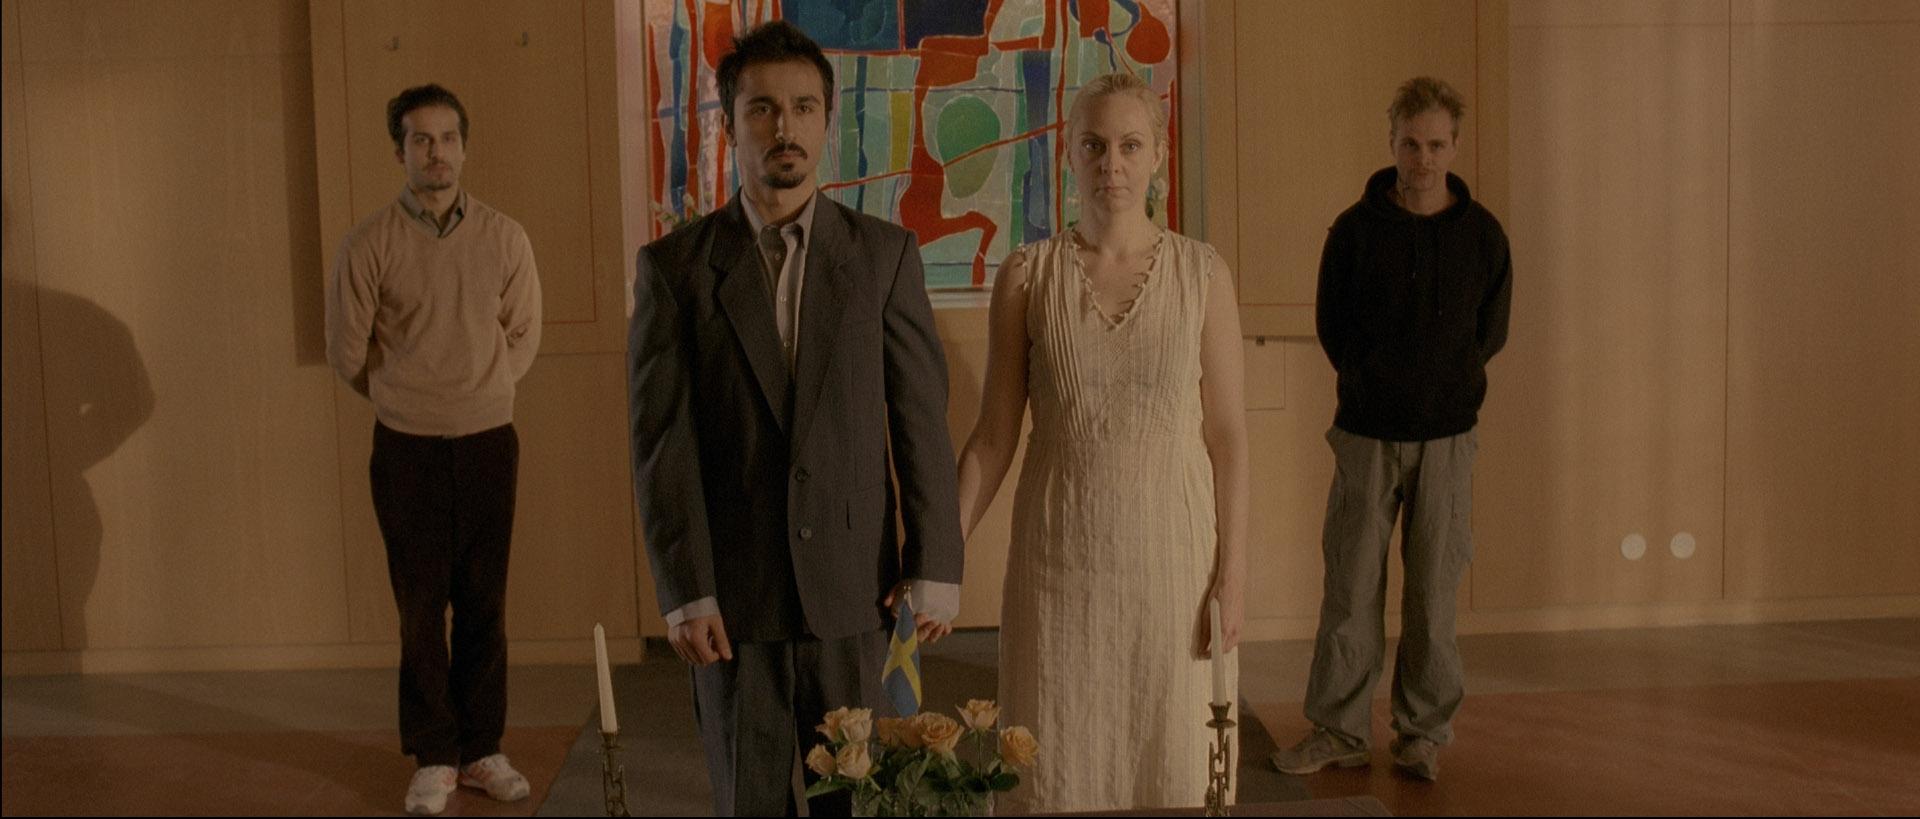 Pressbild bröllop-2.jpg